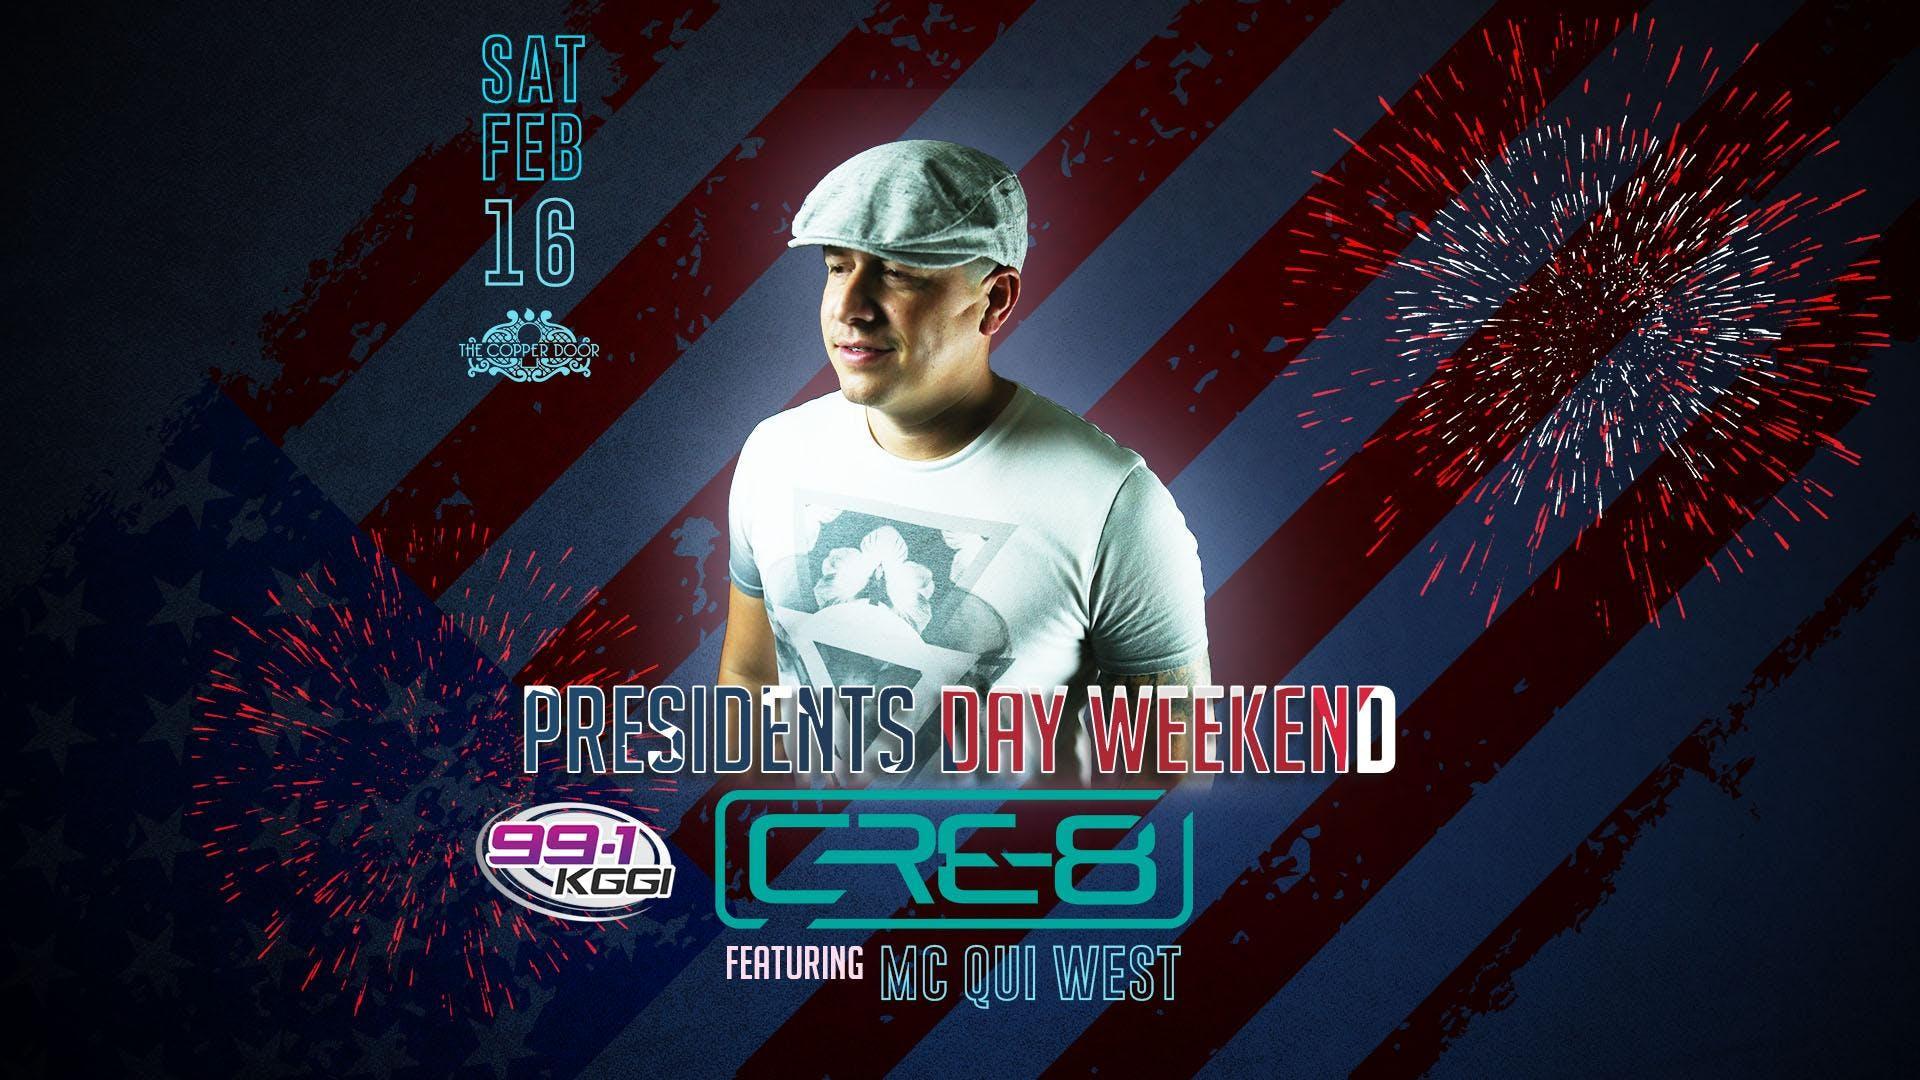 President Day Weekend 99.1 KGGI DJ Cre-8 & MC